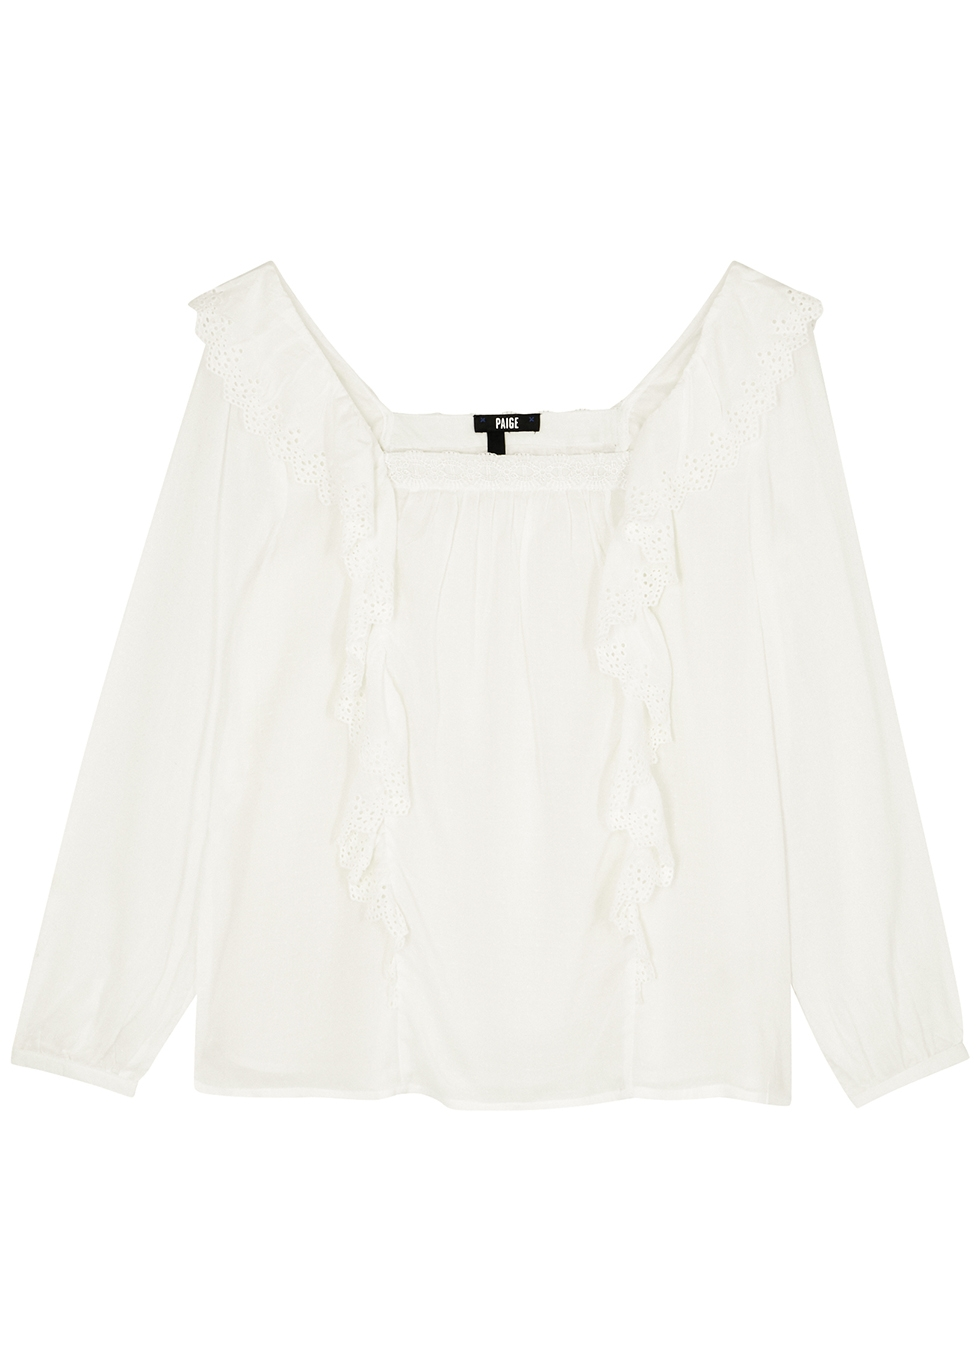 Brylen white ruffle-trimmed blouse